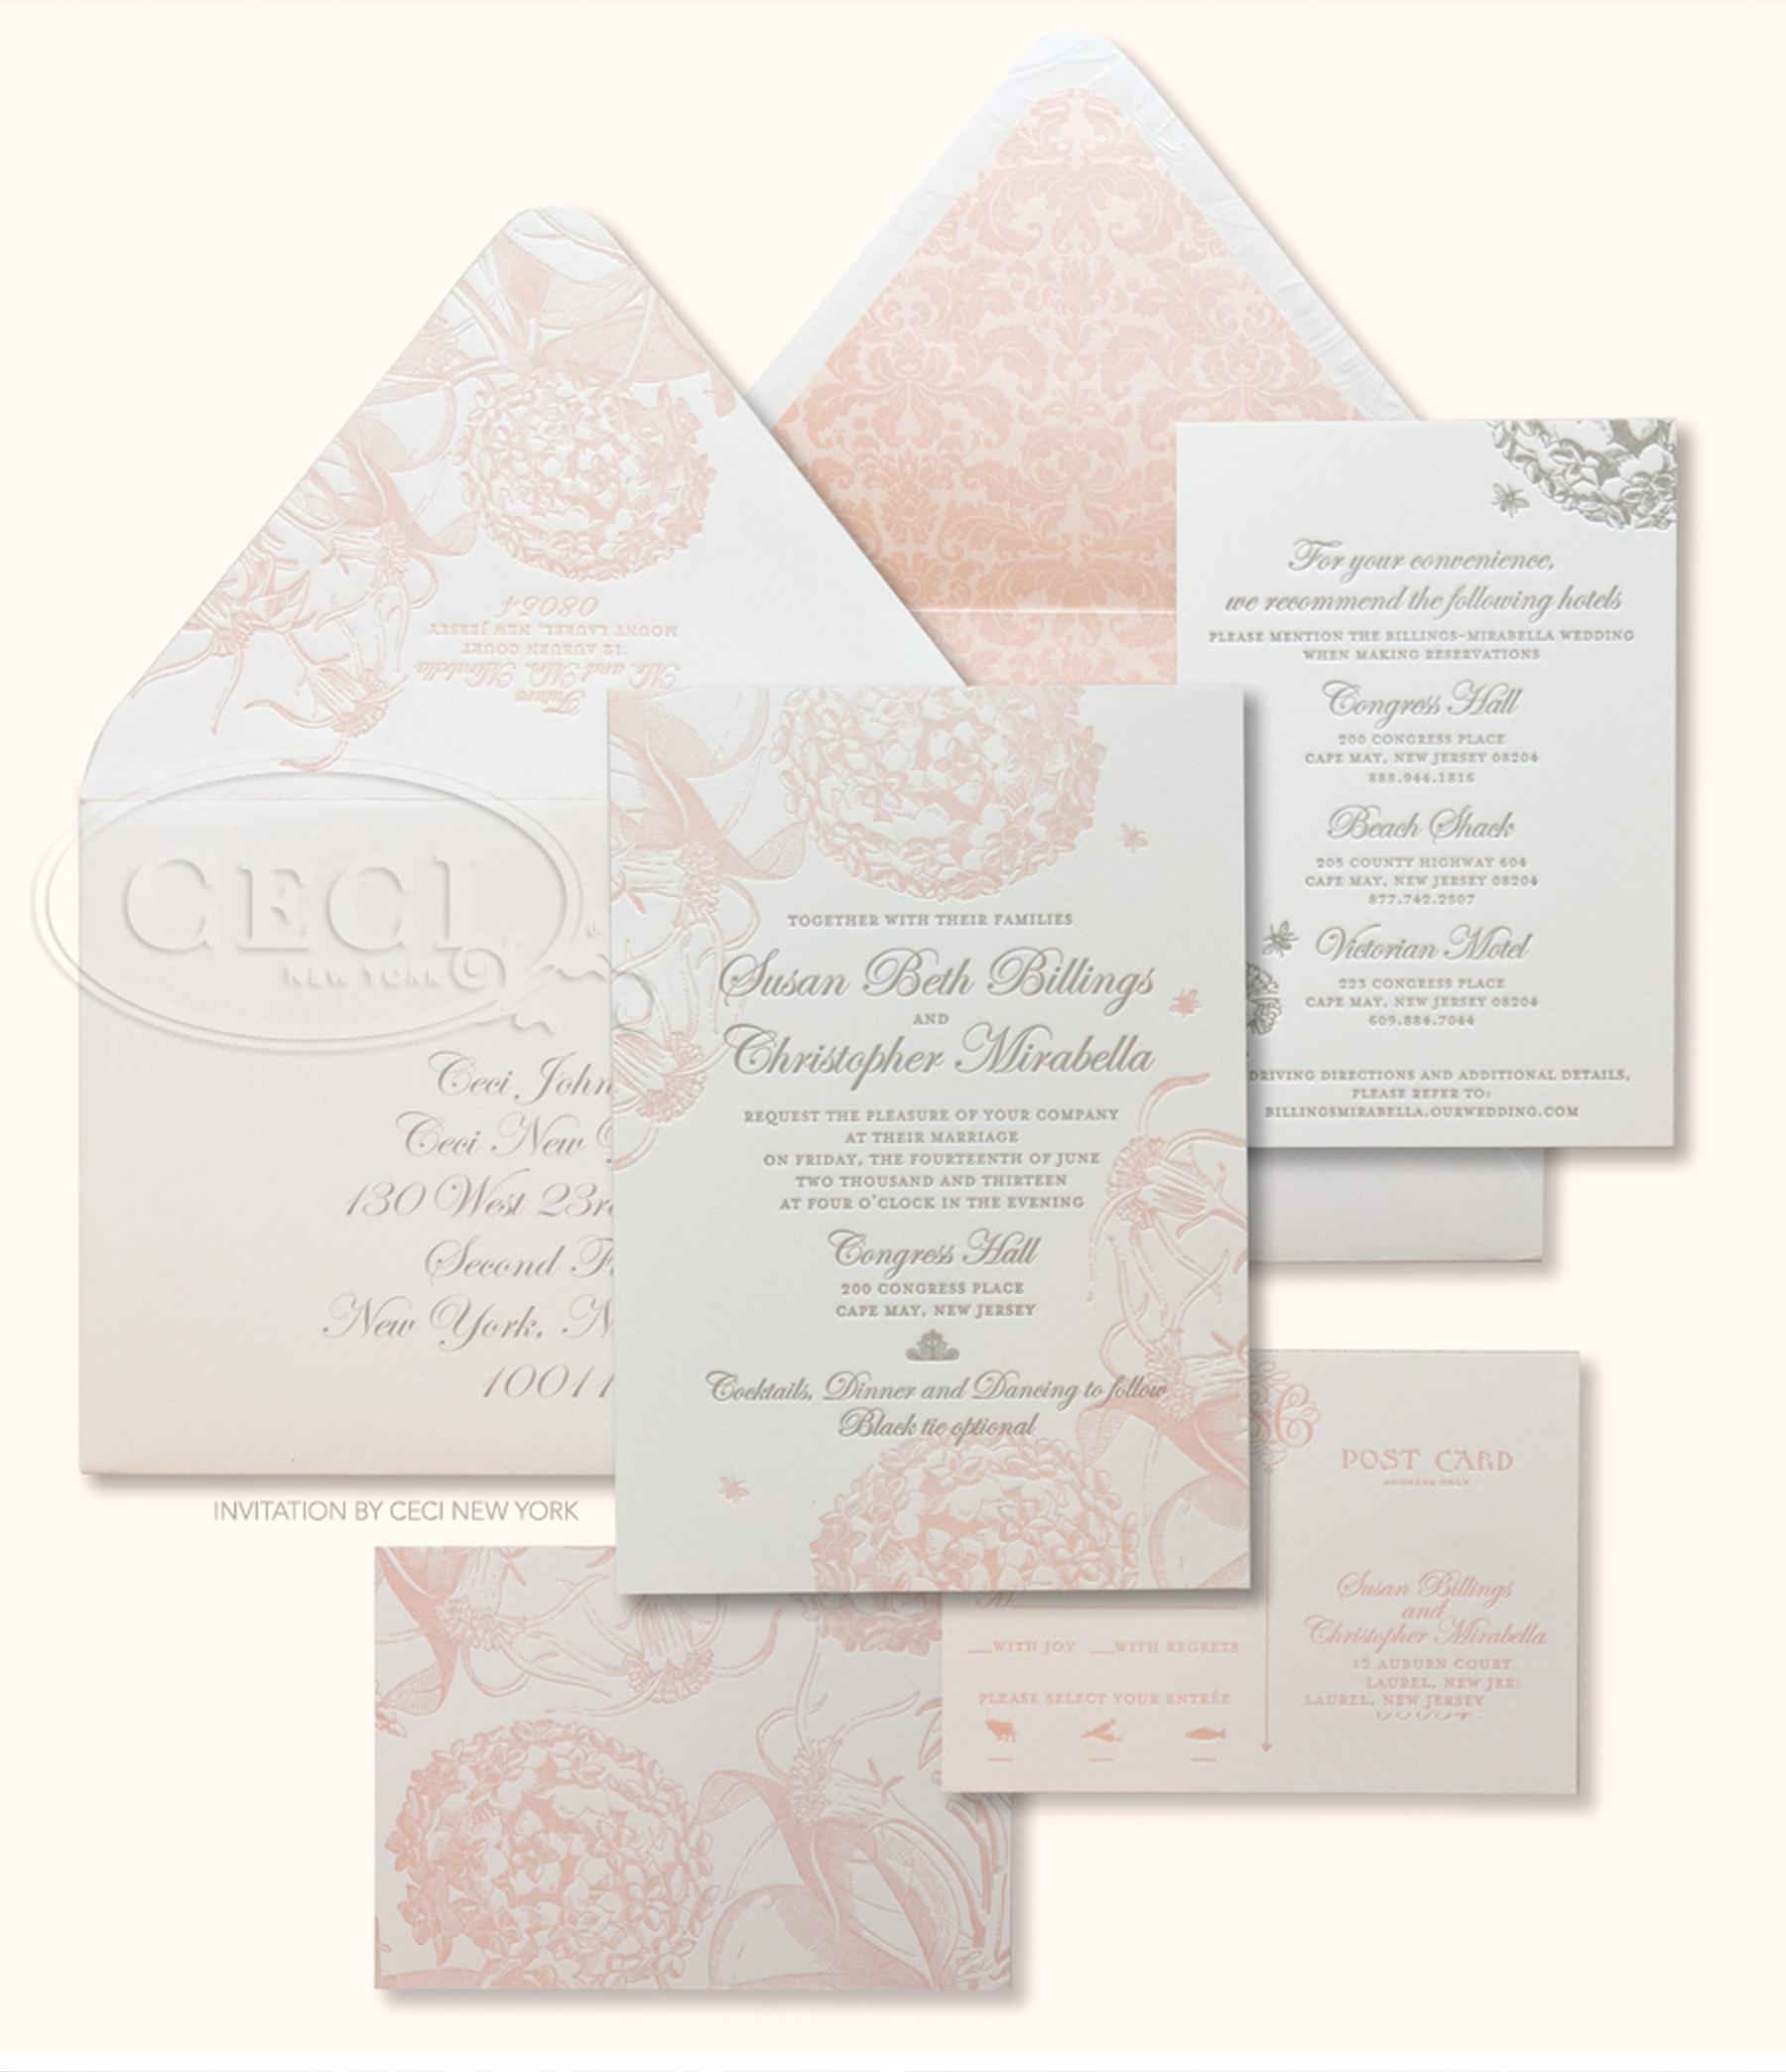 pink_pewter_wedding_letterpress_cape_may_congress_hall_new_jersey_luxury_invitation_v203_om_1a.jpg